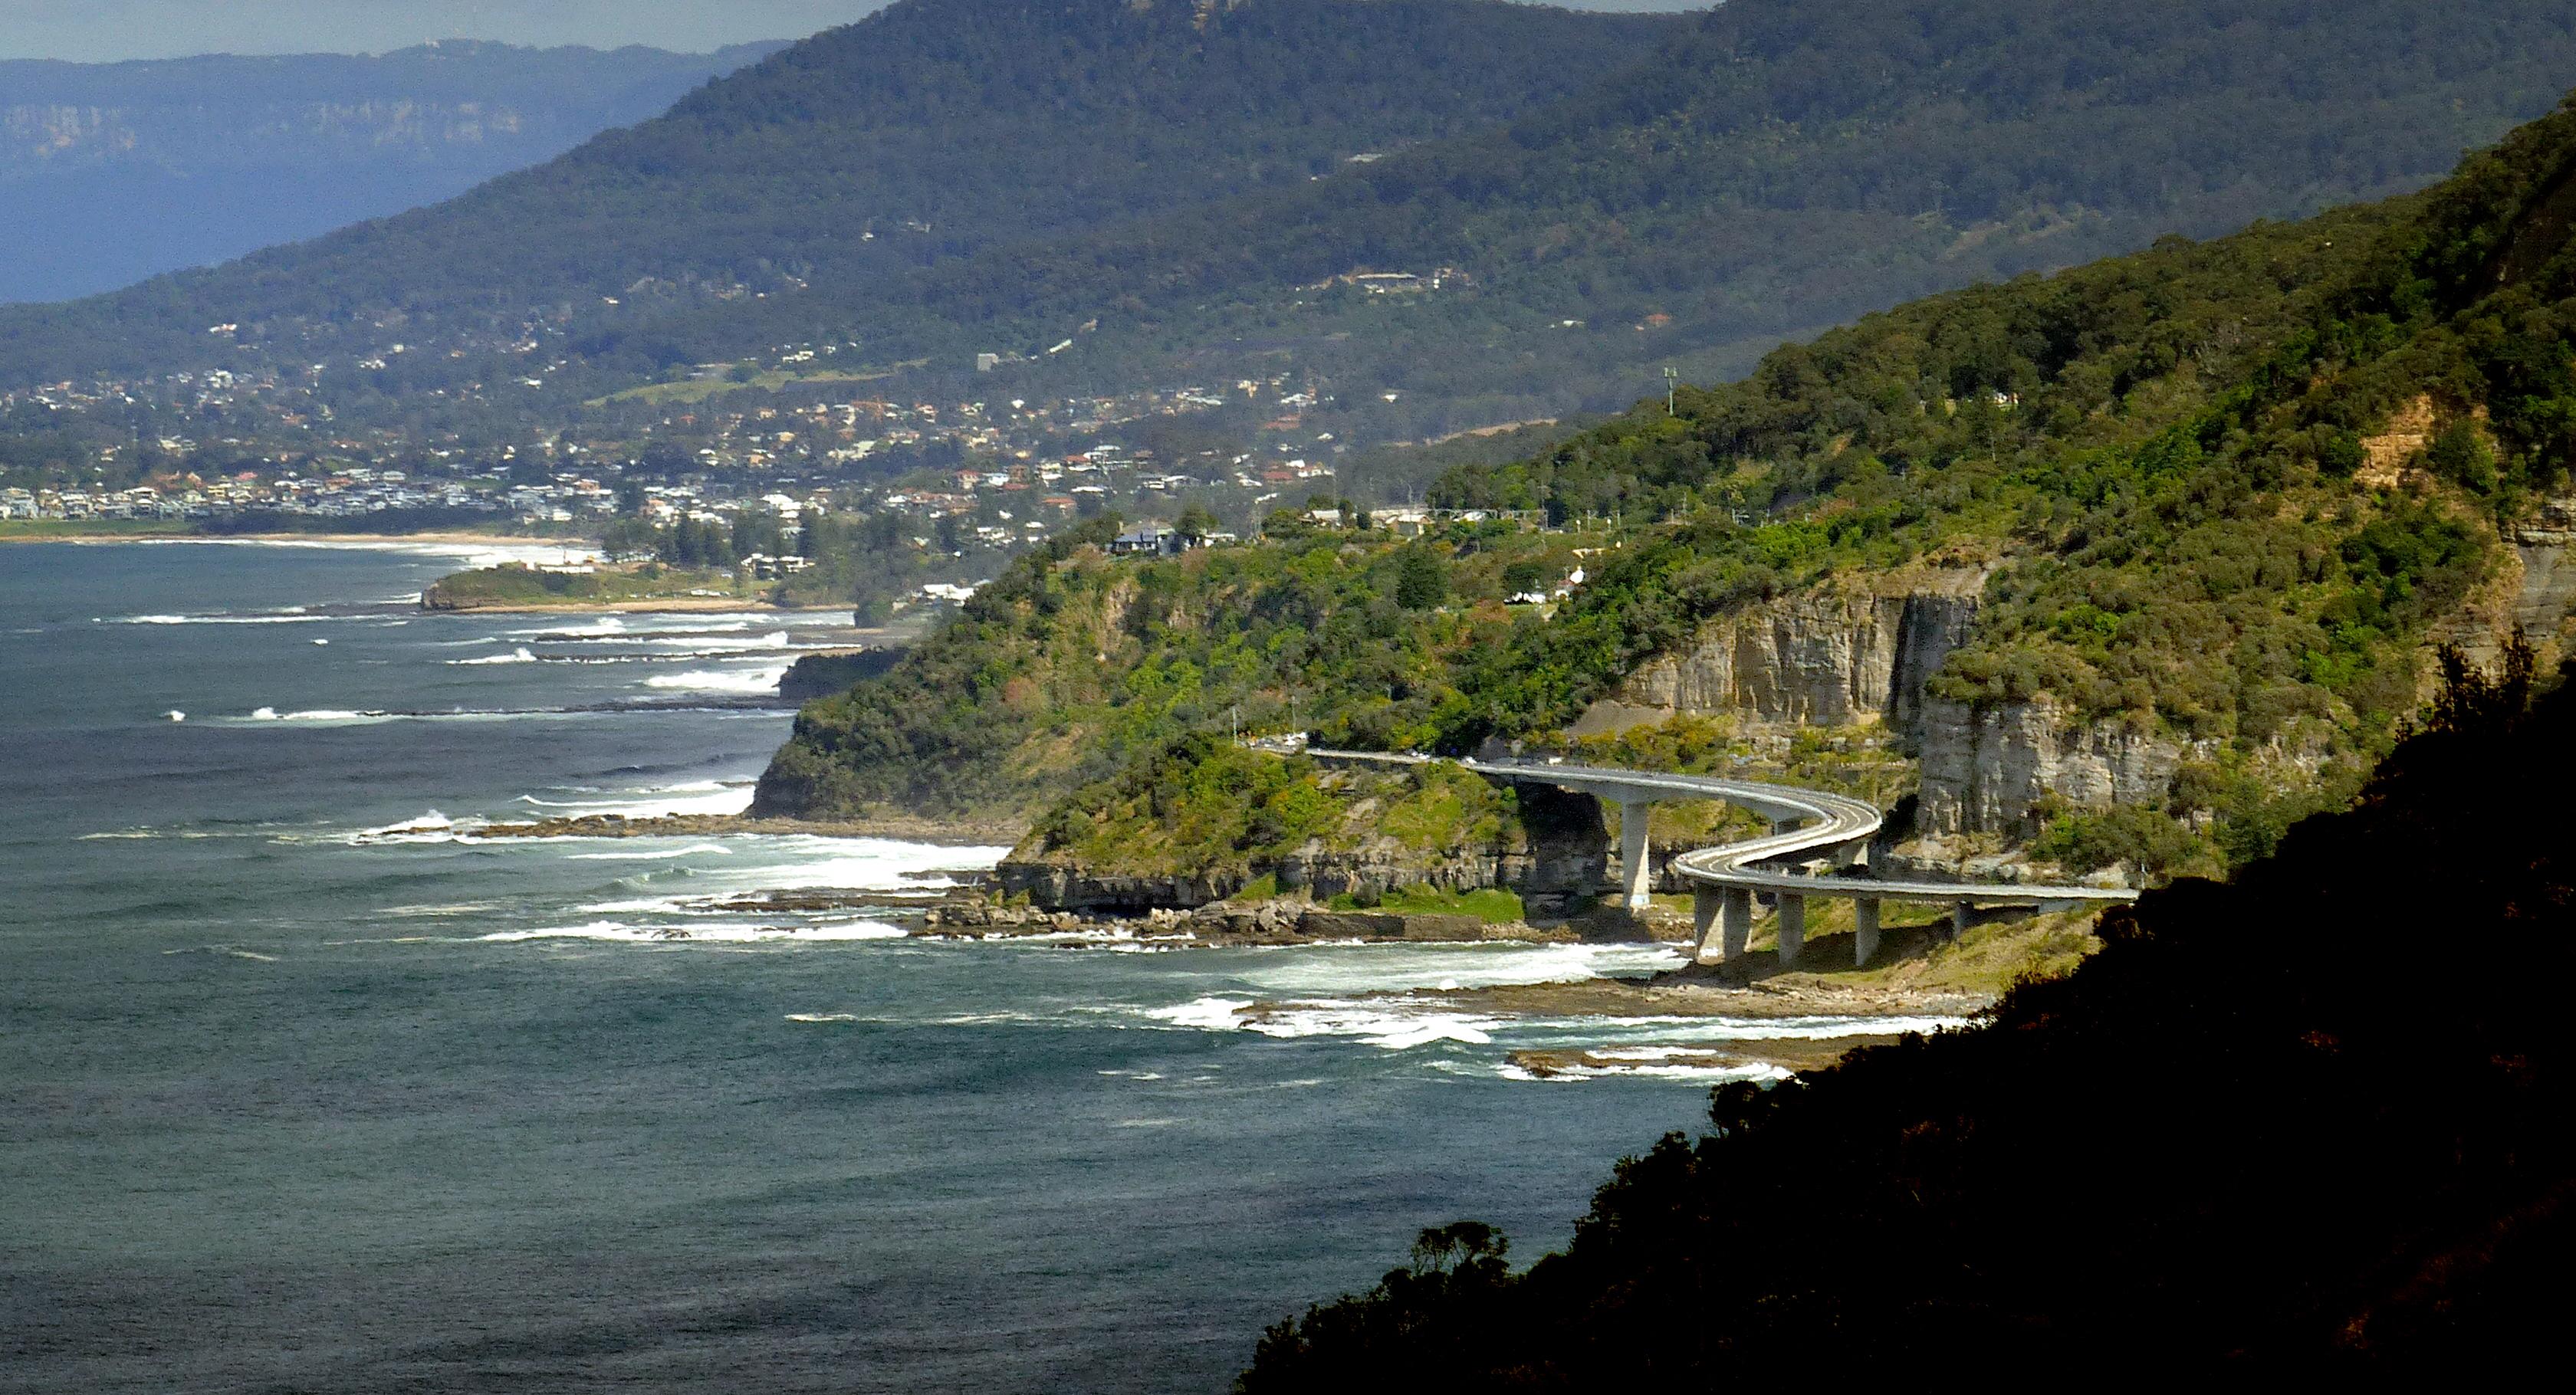 The Sea Cliff Bridge. Clifton. NSW, Australia, Bridge cameras, Bridges, Coastline, HQ Photo